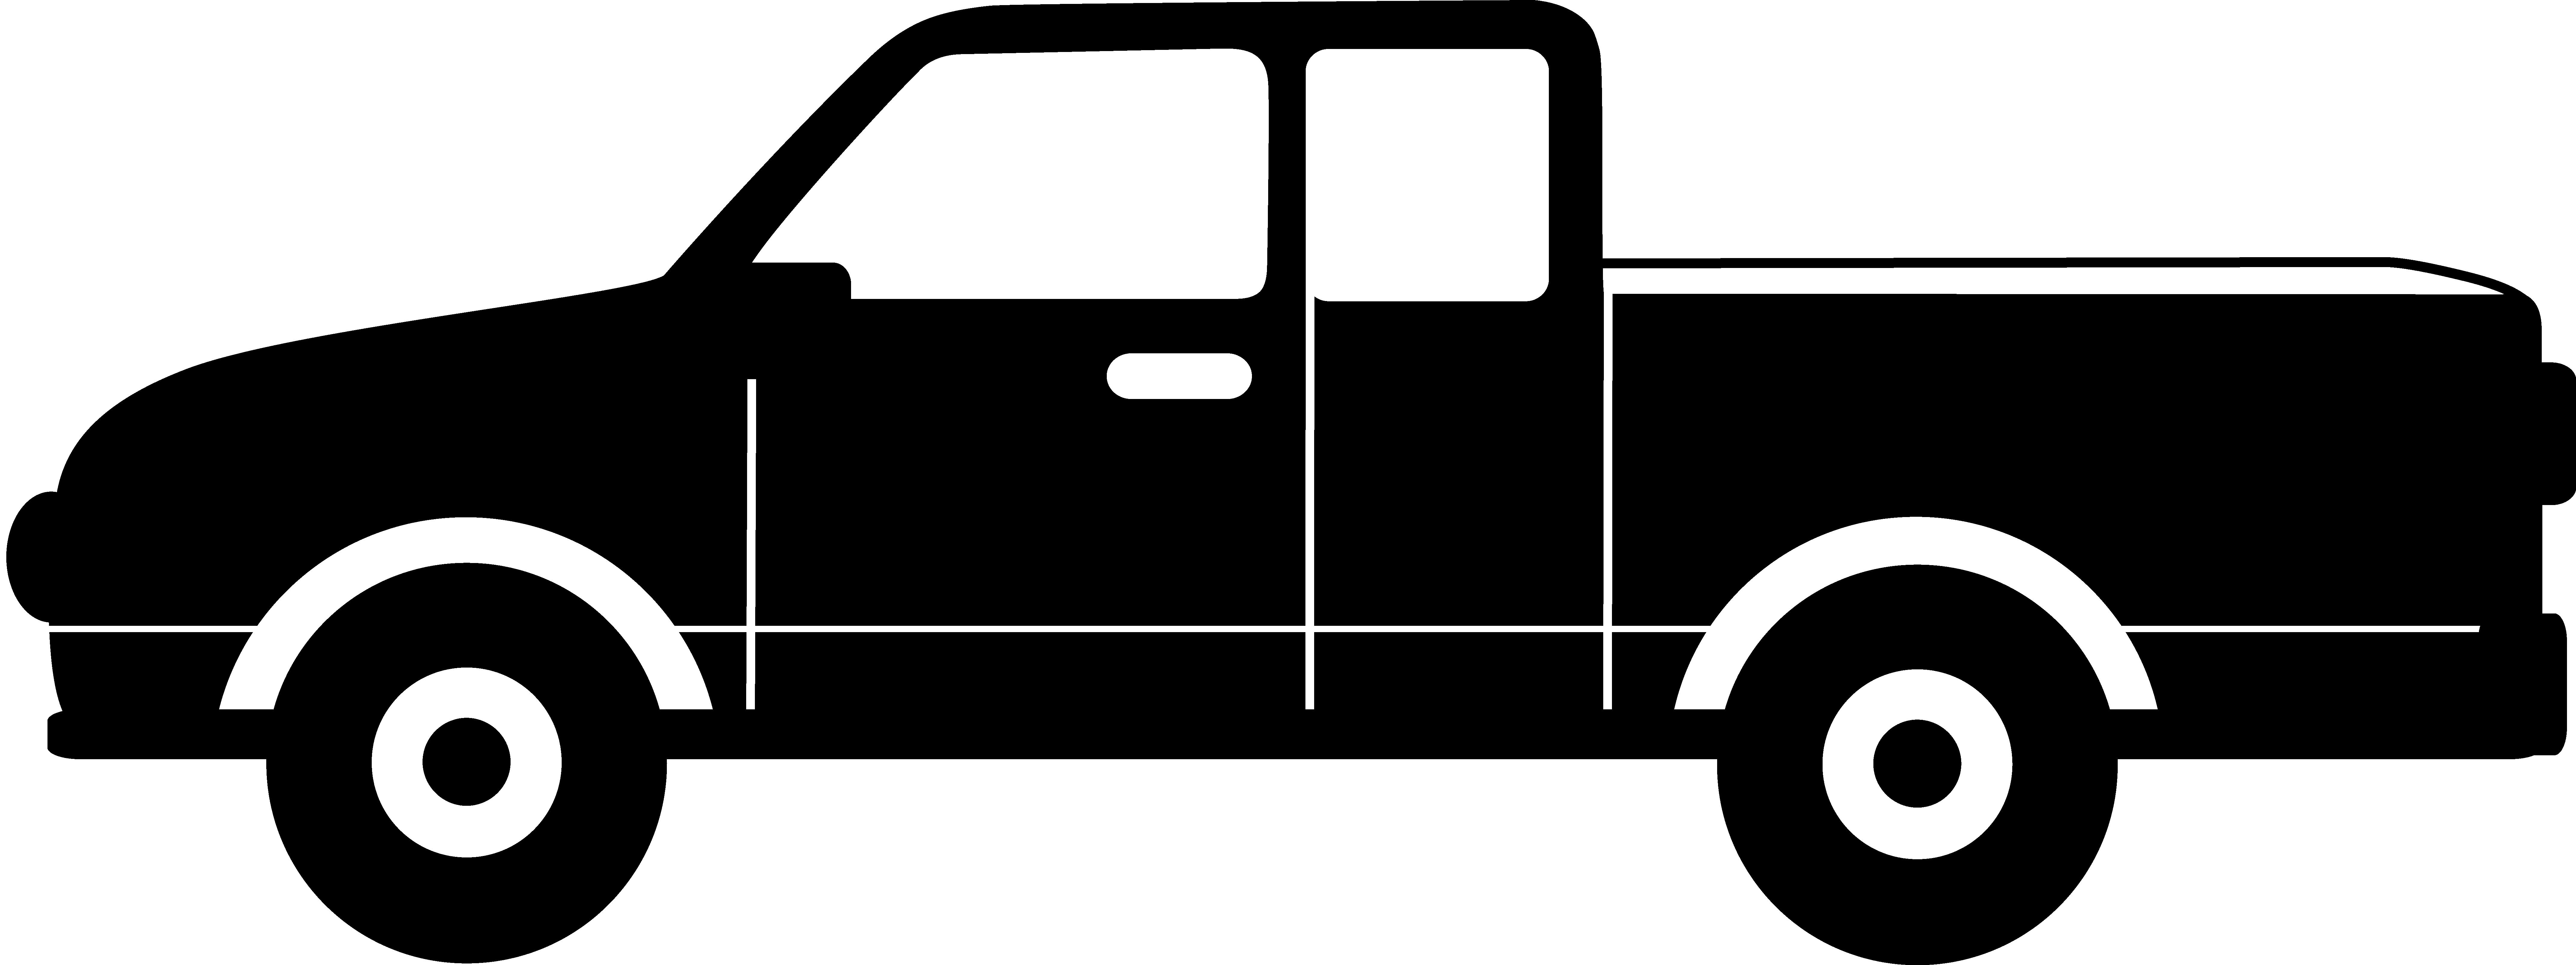 Trucks Clip Art u0026middot; weekend clipart u0026middot; vehicle clipart